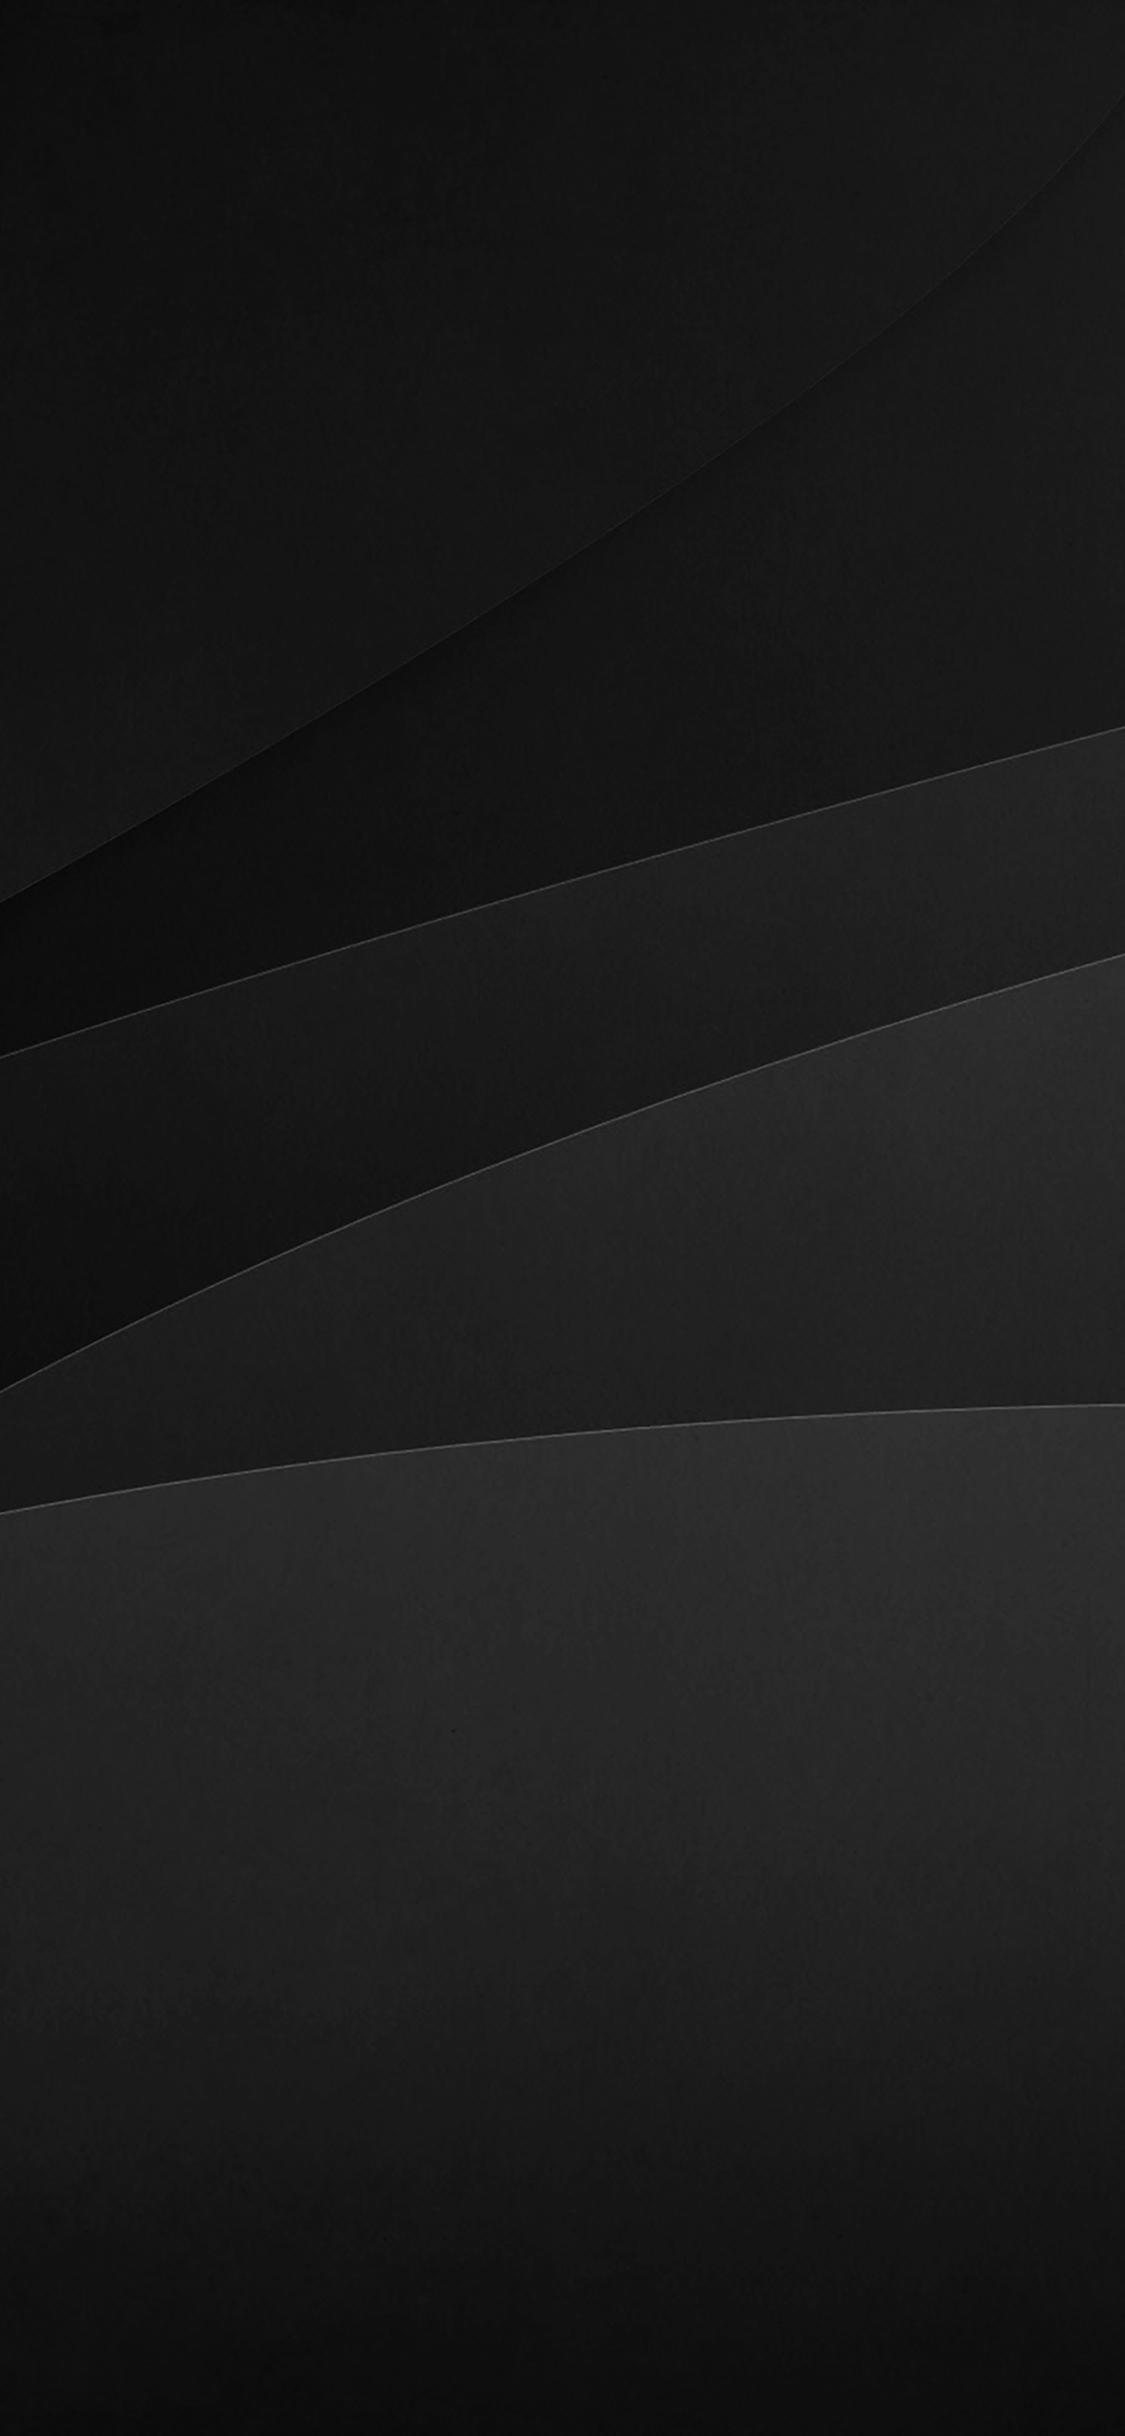 iPhoneXpapers.com-Apple-iPhone-wallpaper-vd92-shining-aqua-black-abstract-art-pattern